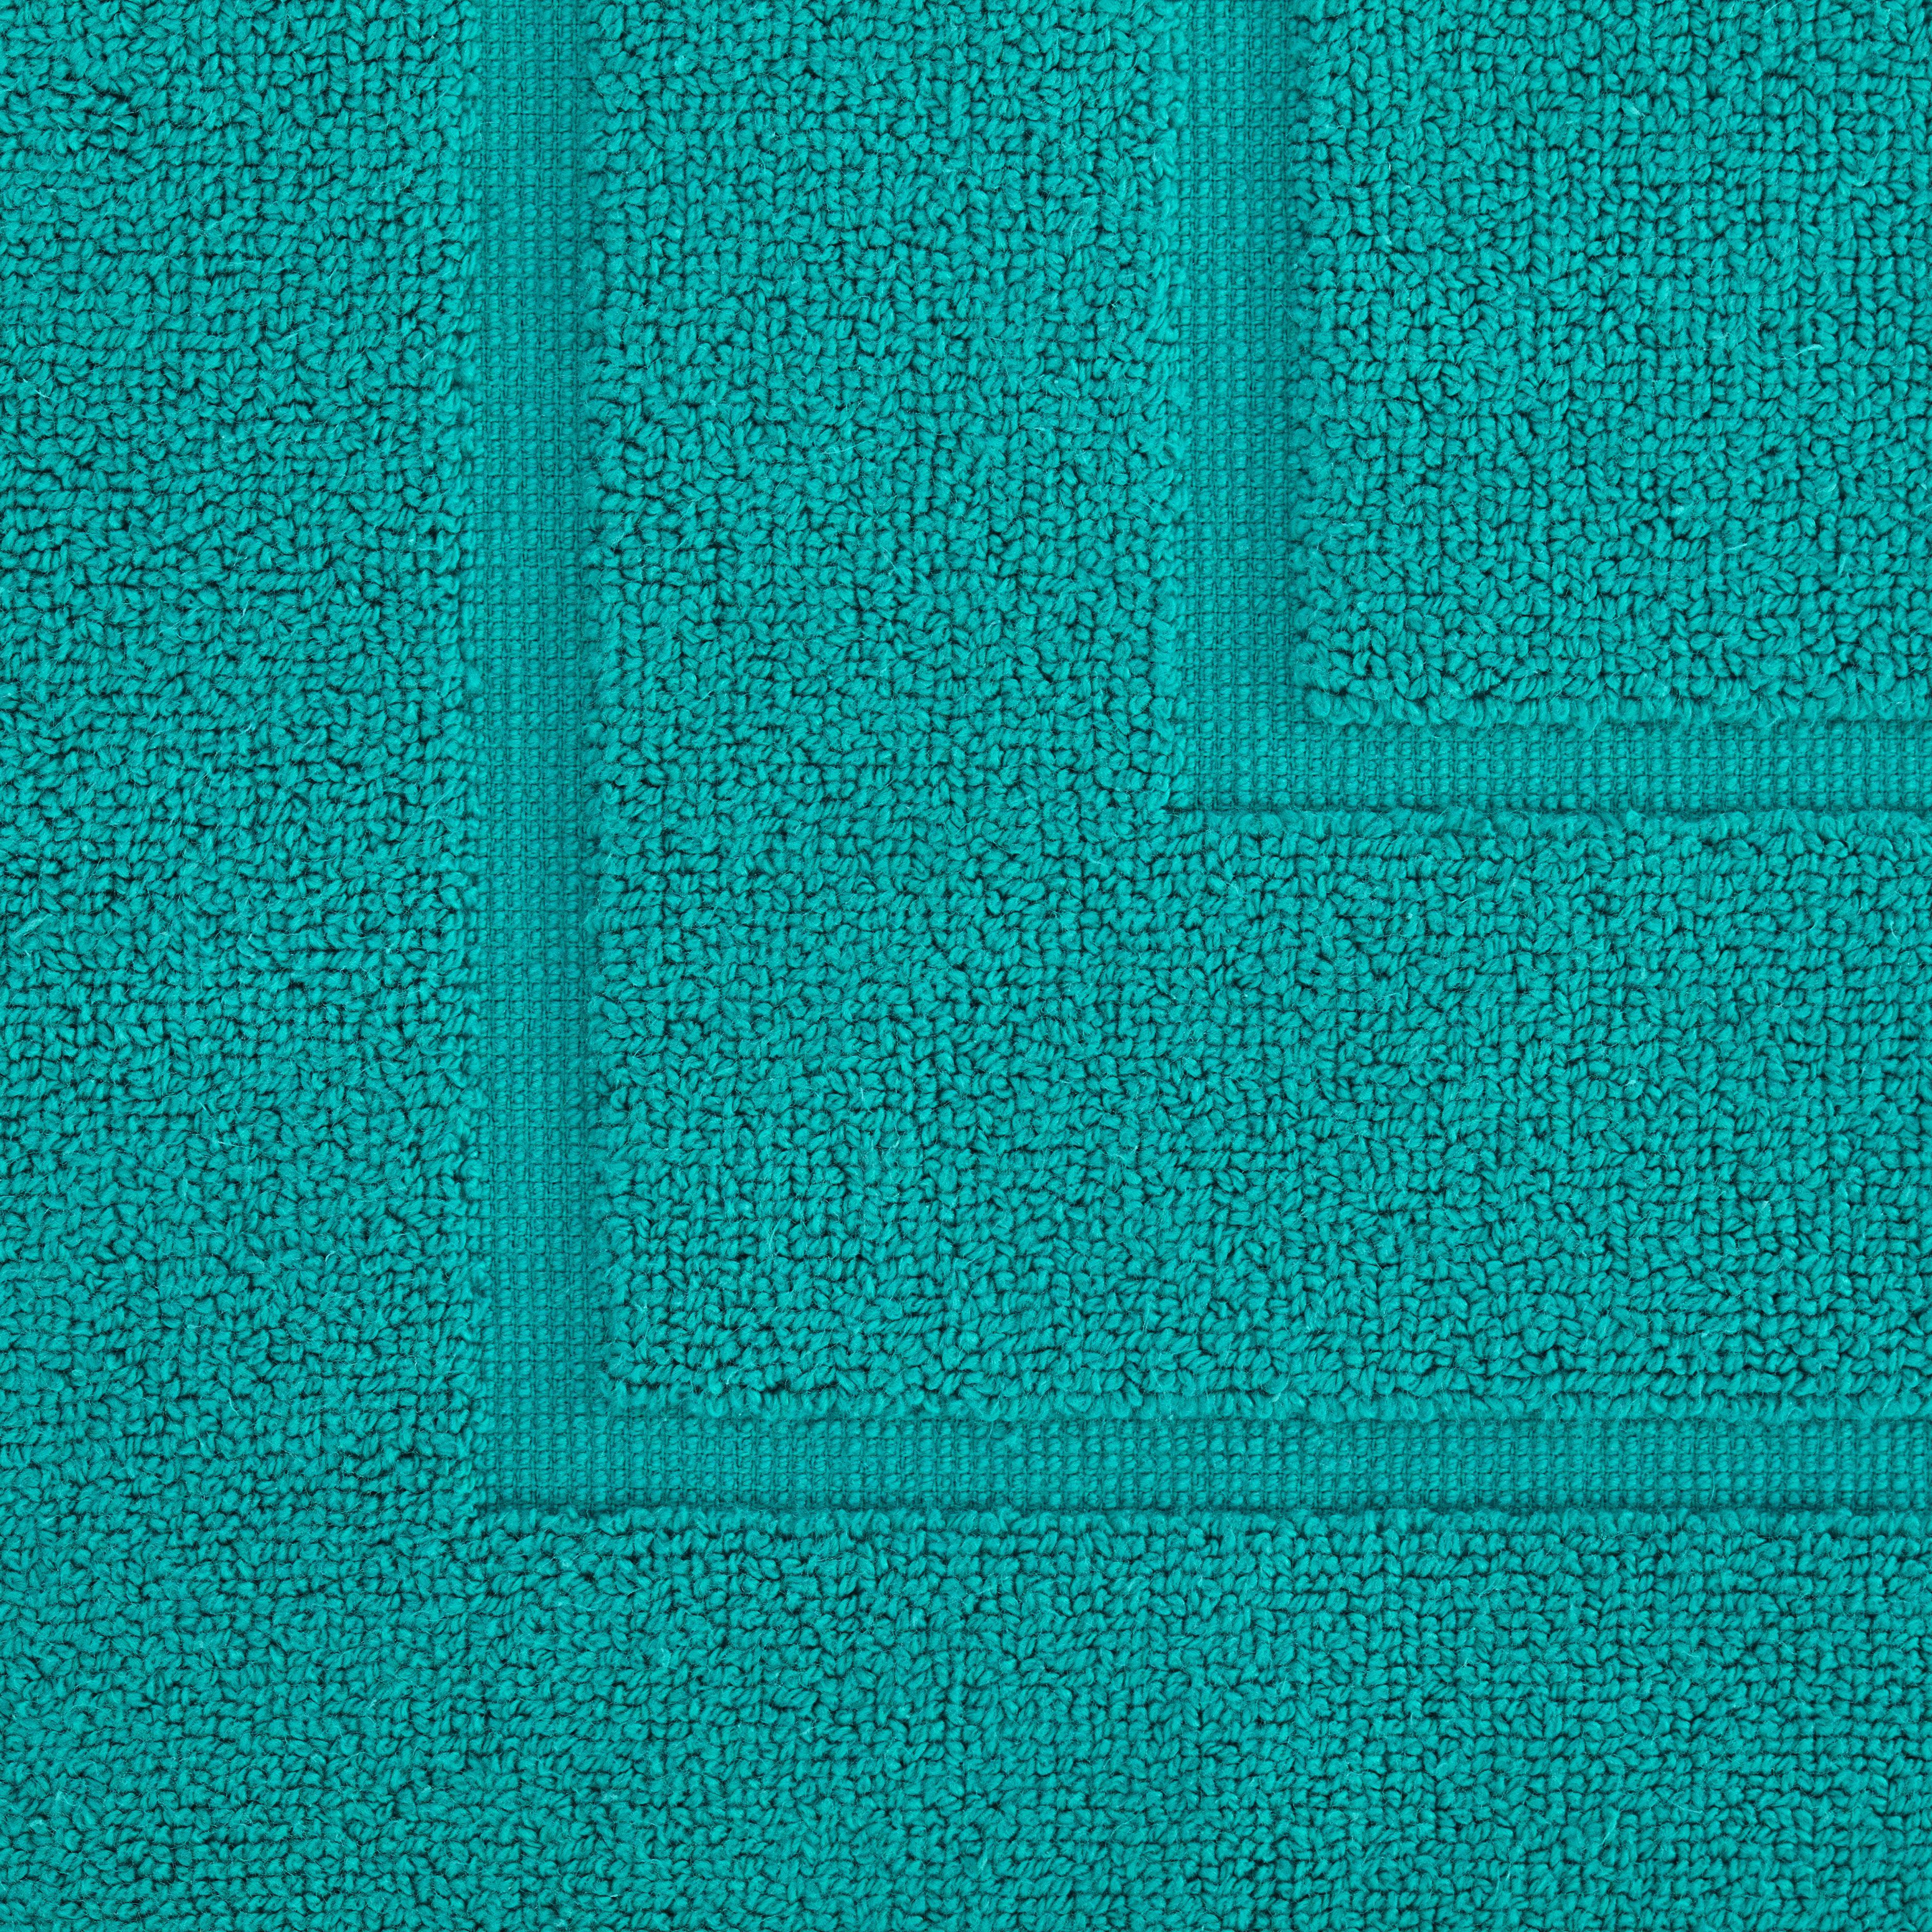 Badematte Dolly 50x80cm - Türkis, MODERN, Textil (50/80cm) - MODERN LIVING